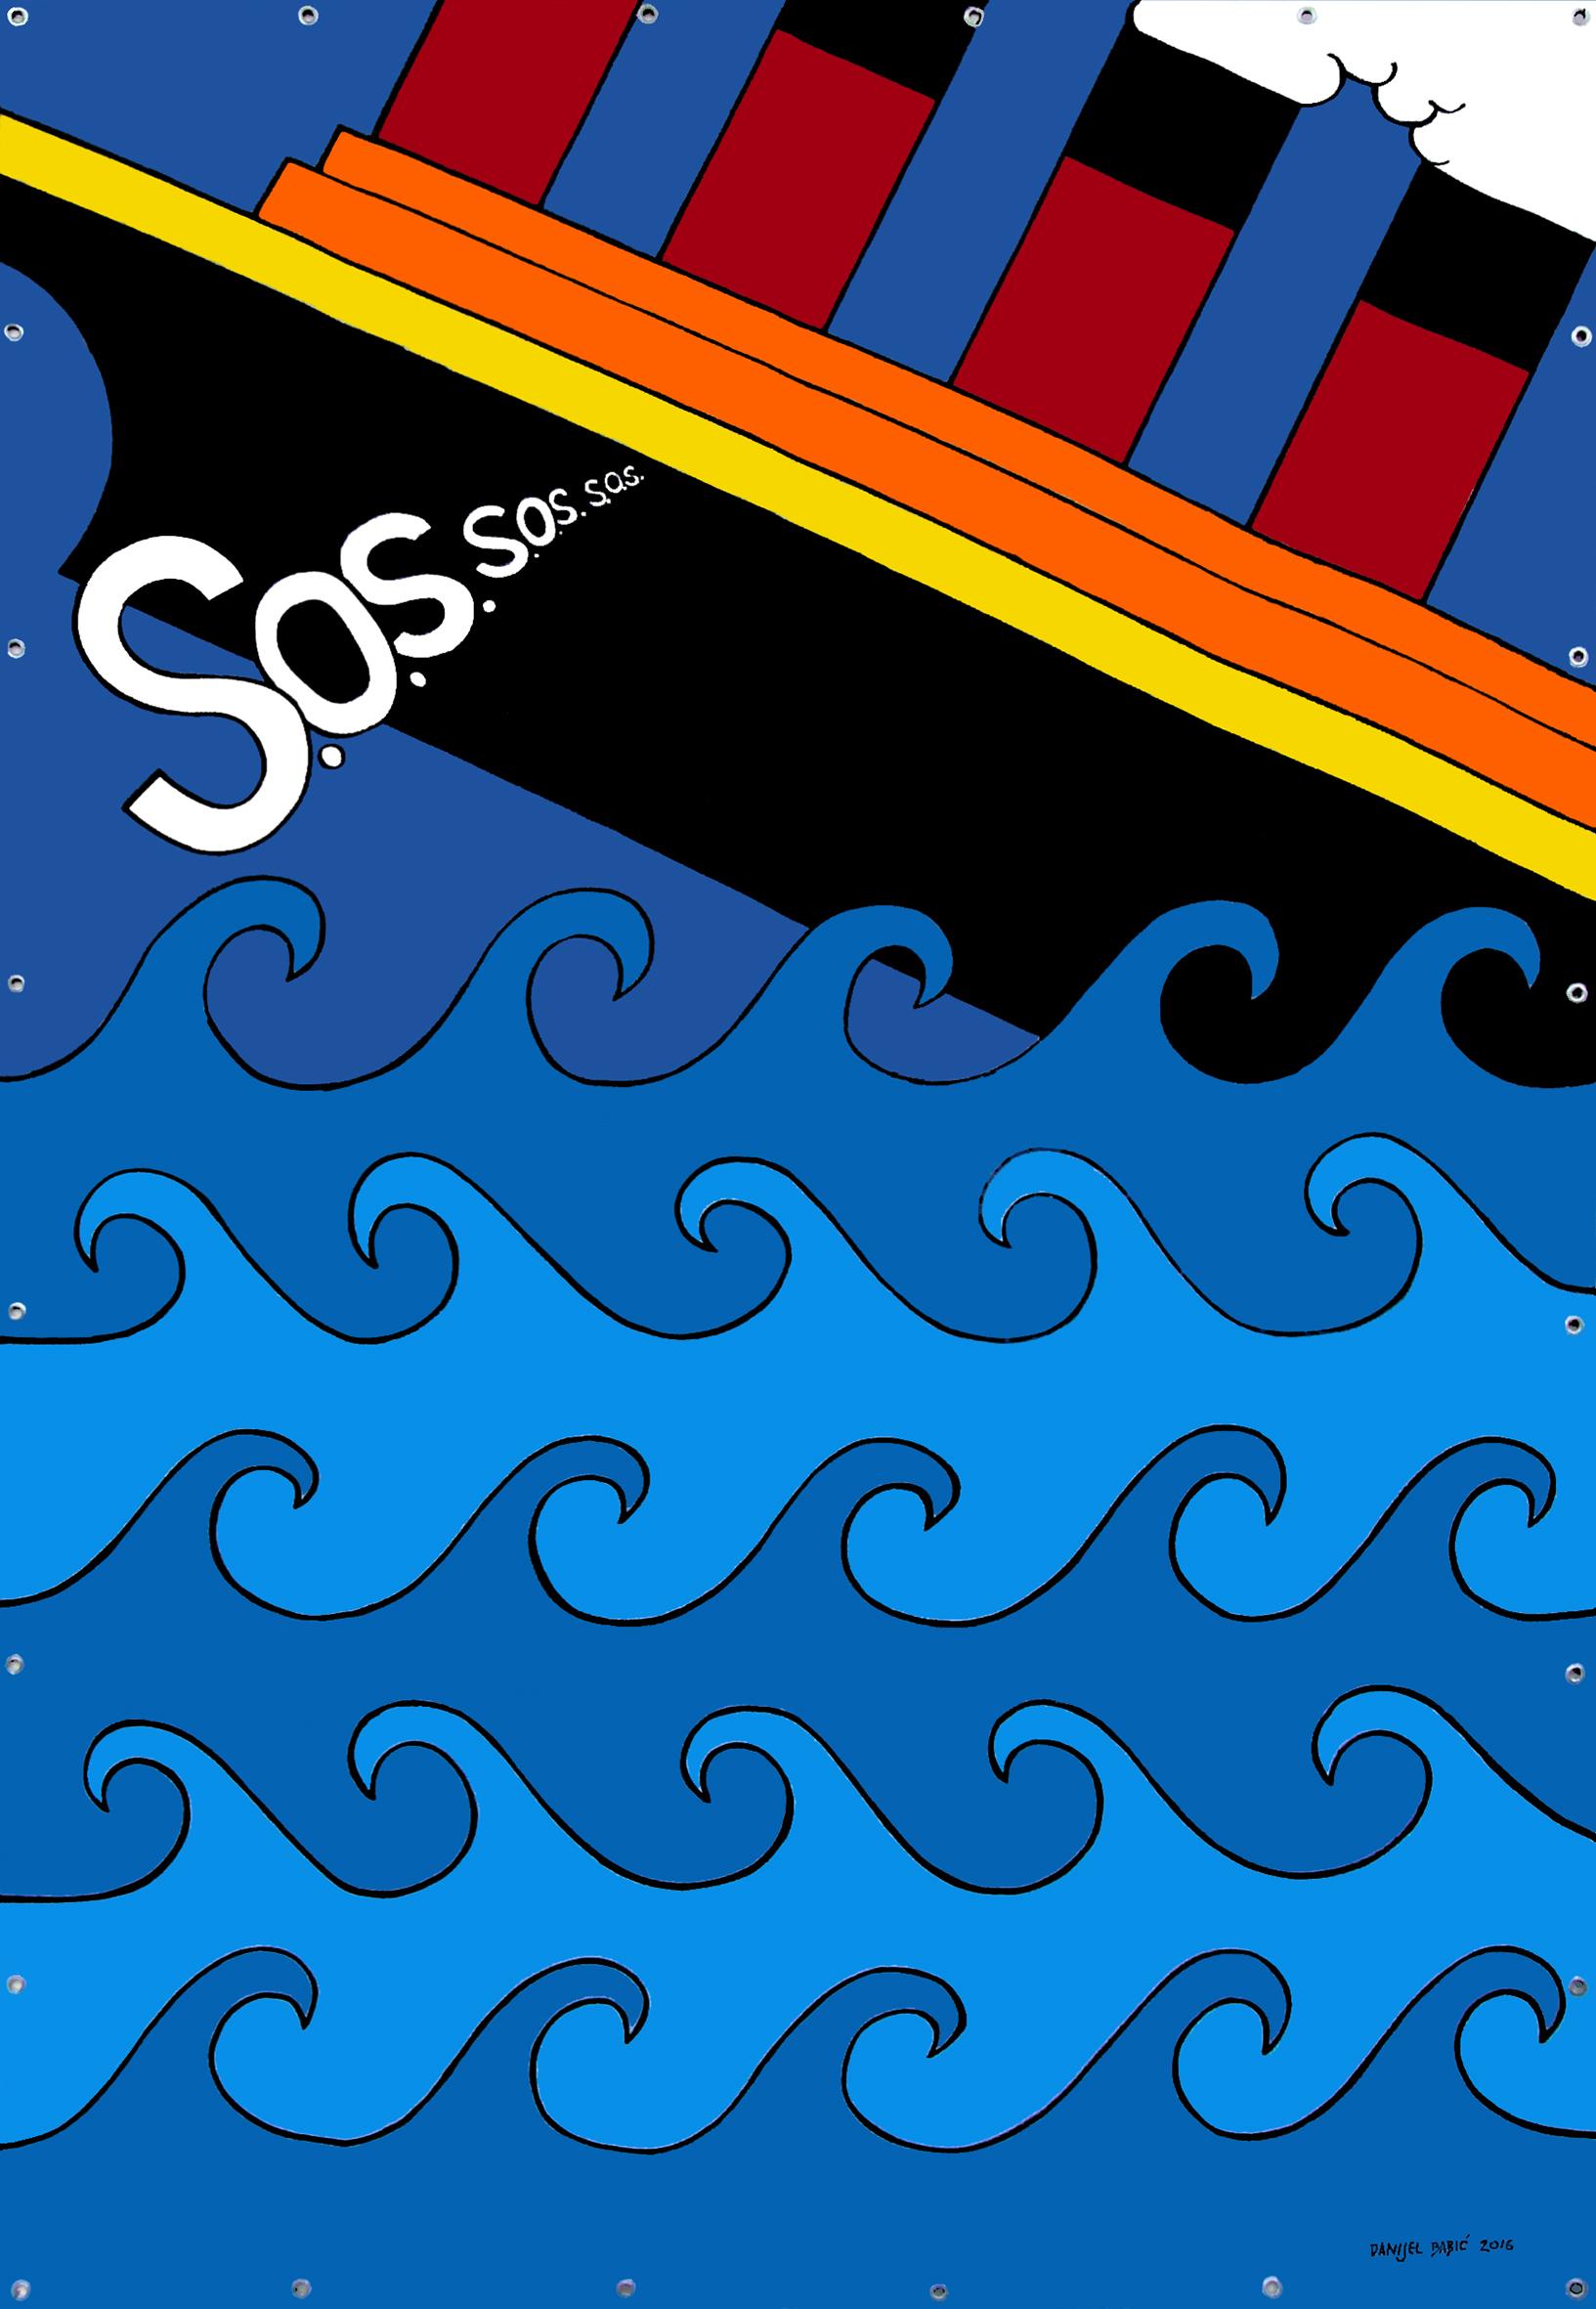 S.O.S., 2016, 220 x 150 cm, acrylic on mesh banner